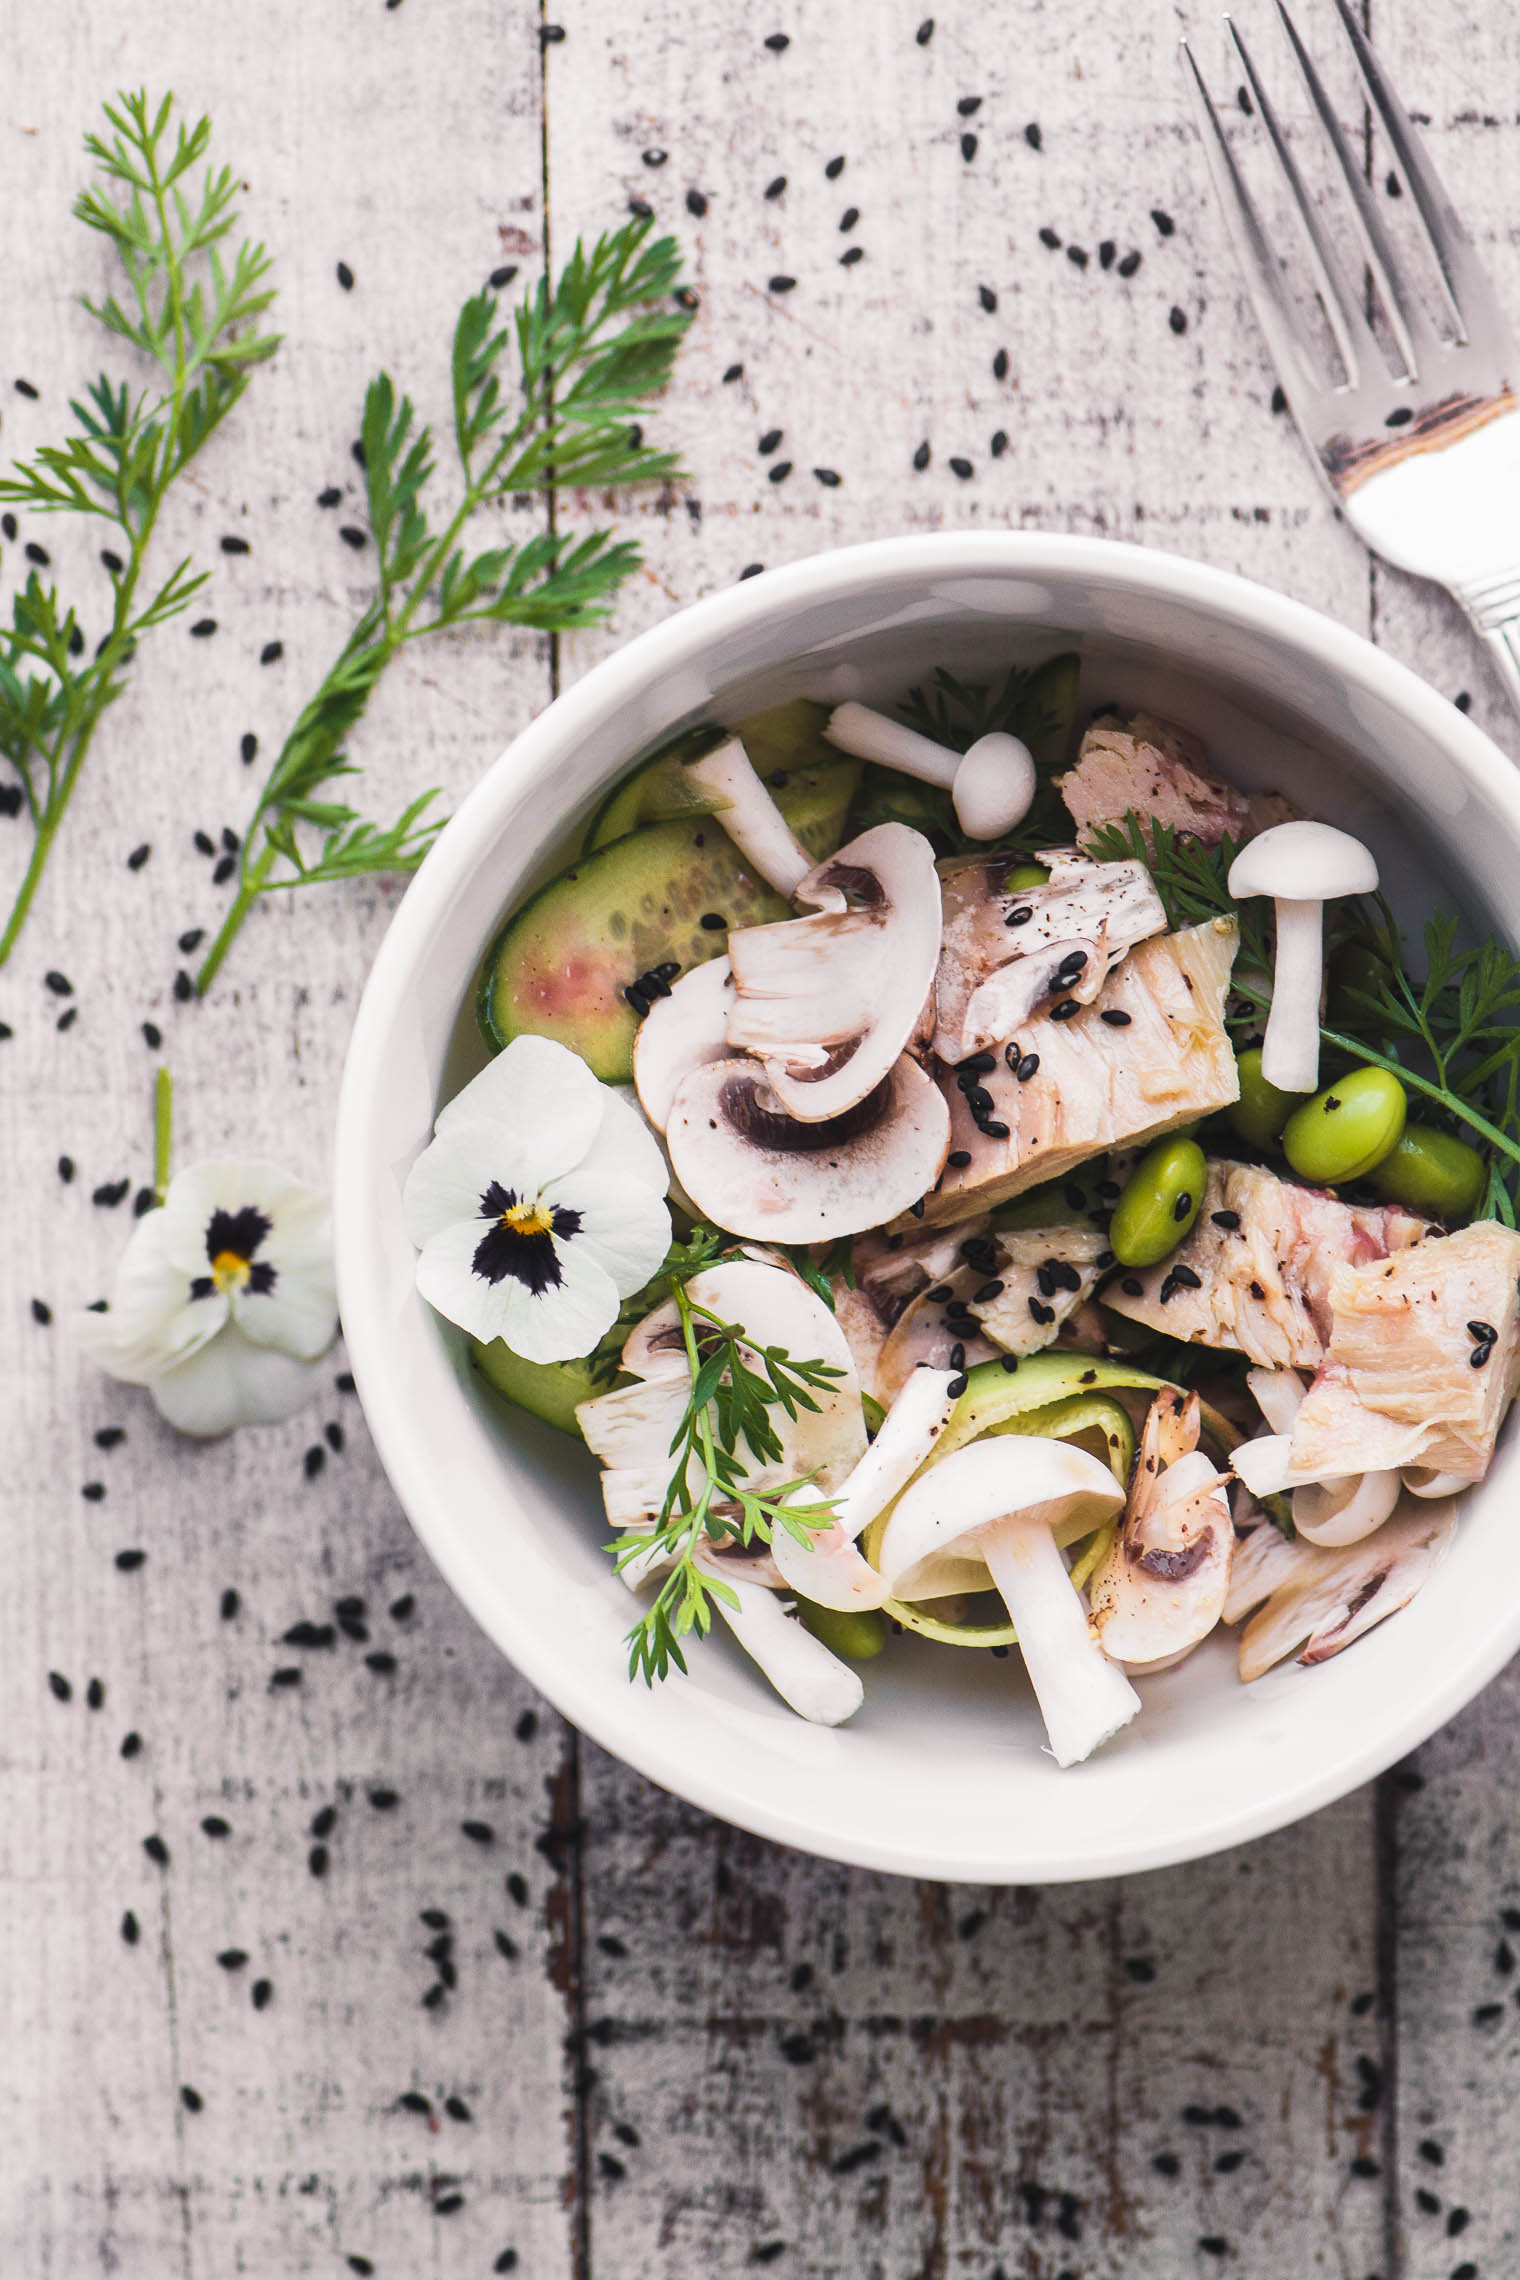 a small bowl of tuna salad